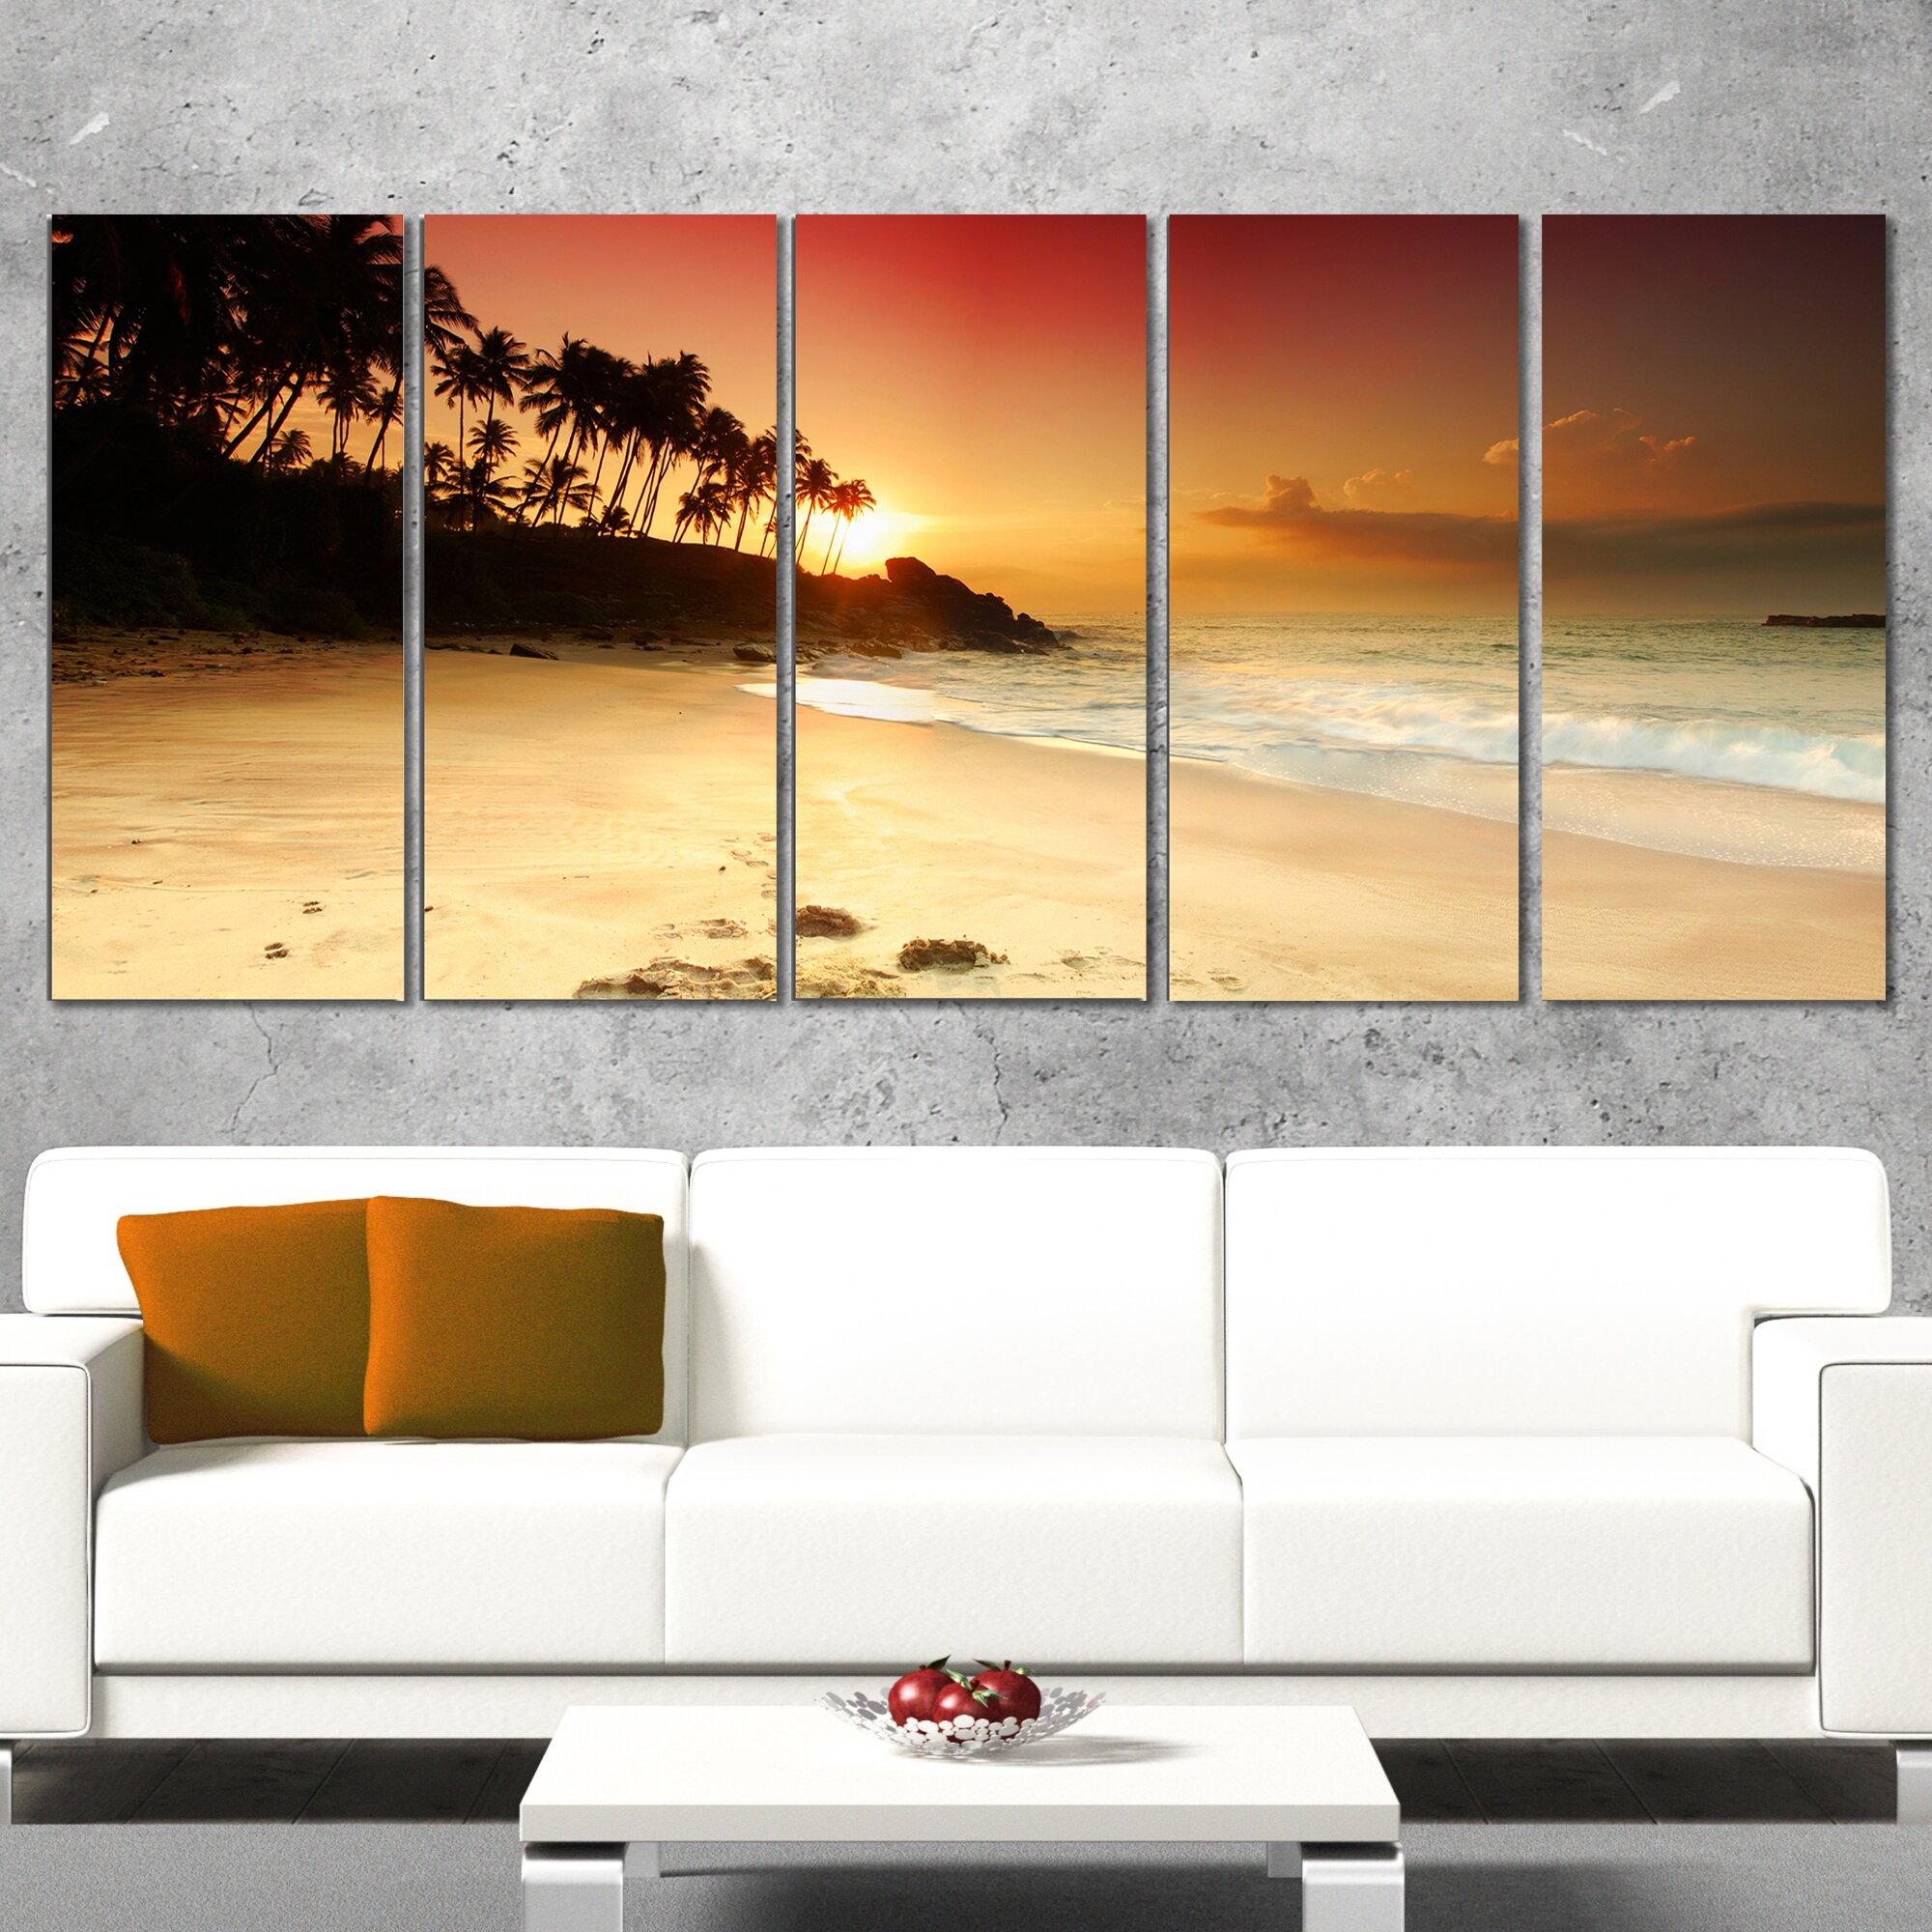 Wall Art Sets For Living Room Designart Amazing Sunset And Beach In Sri Lanka 5 Piece Wall Art